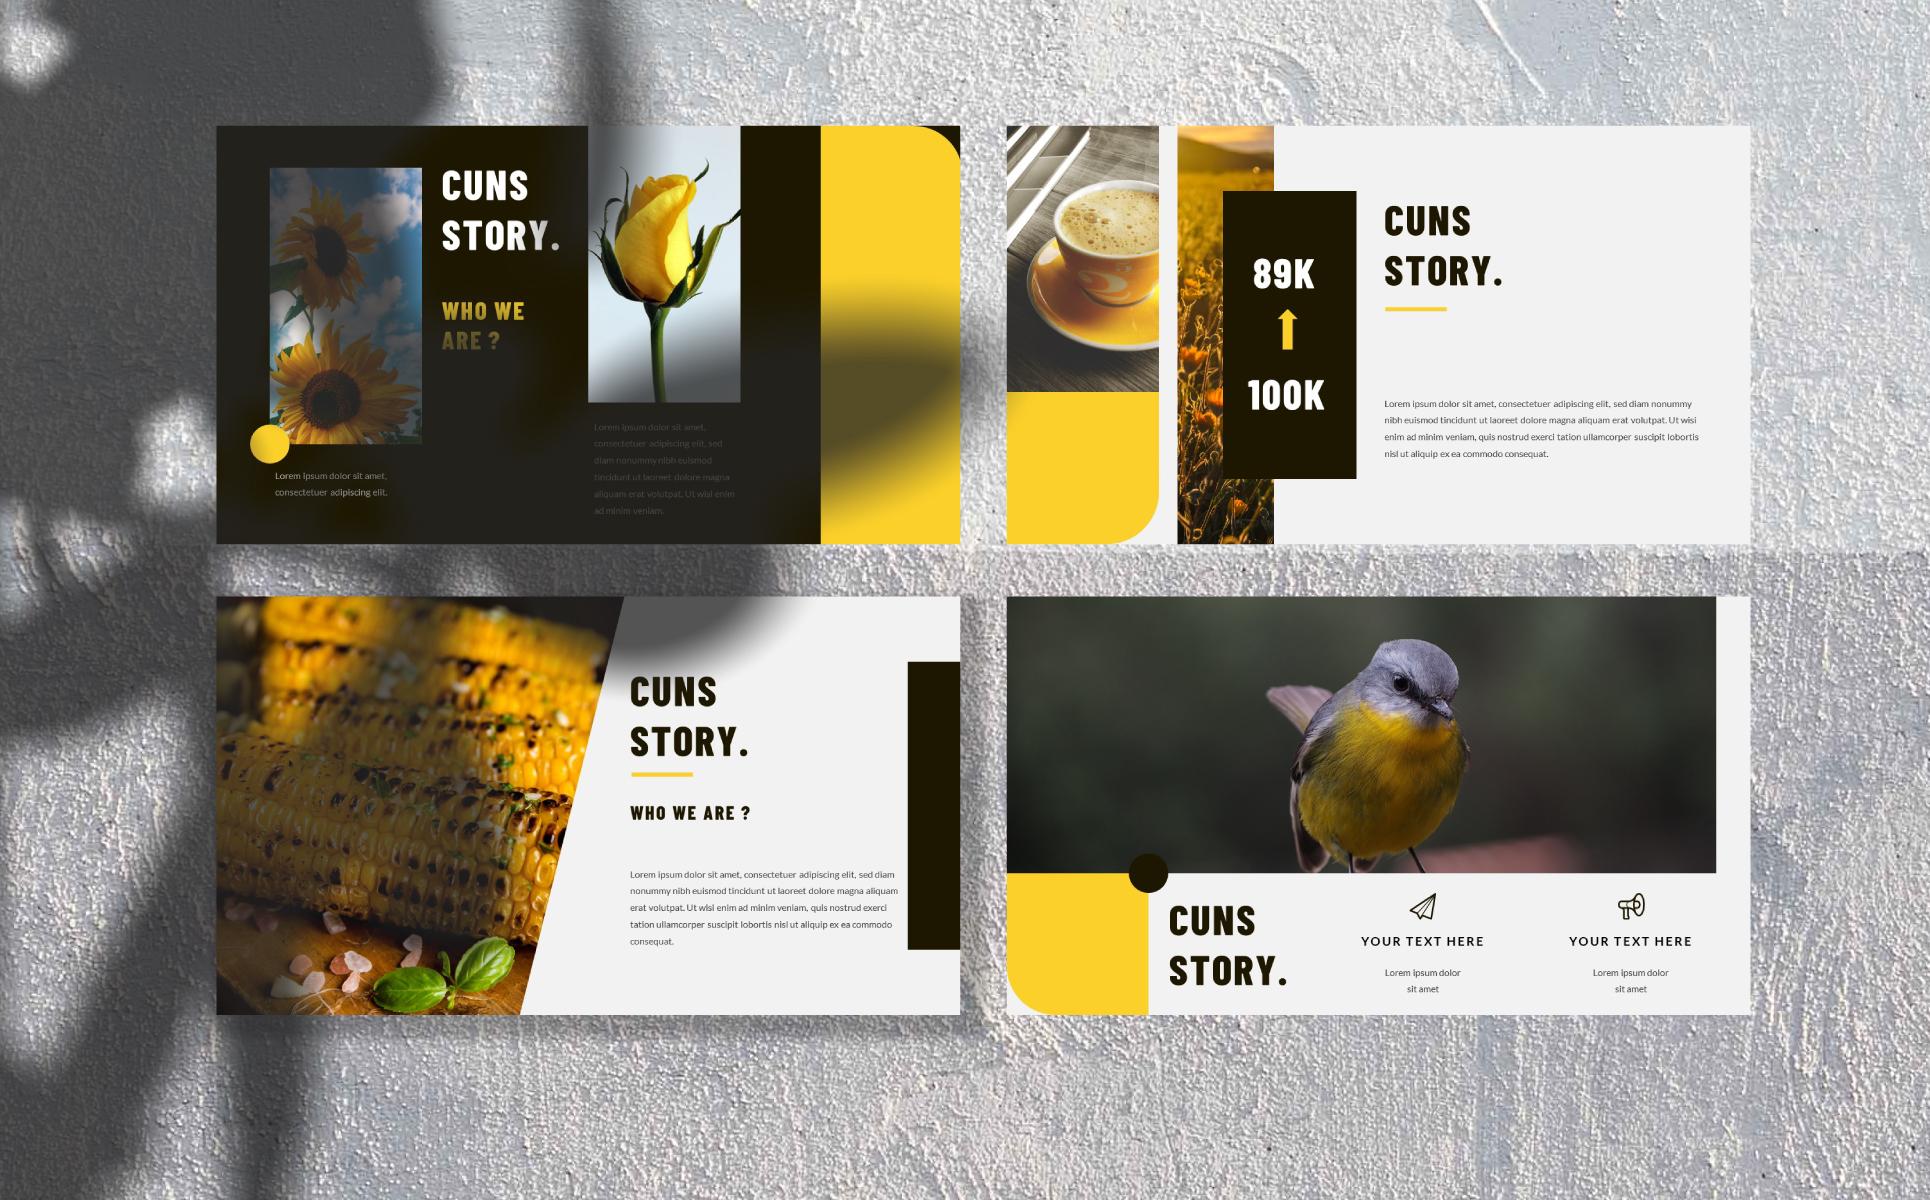 https://s3u.tmimgcdn.com/2178394-1576793903671_Slider-images-3-keynote.jpg